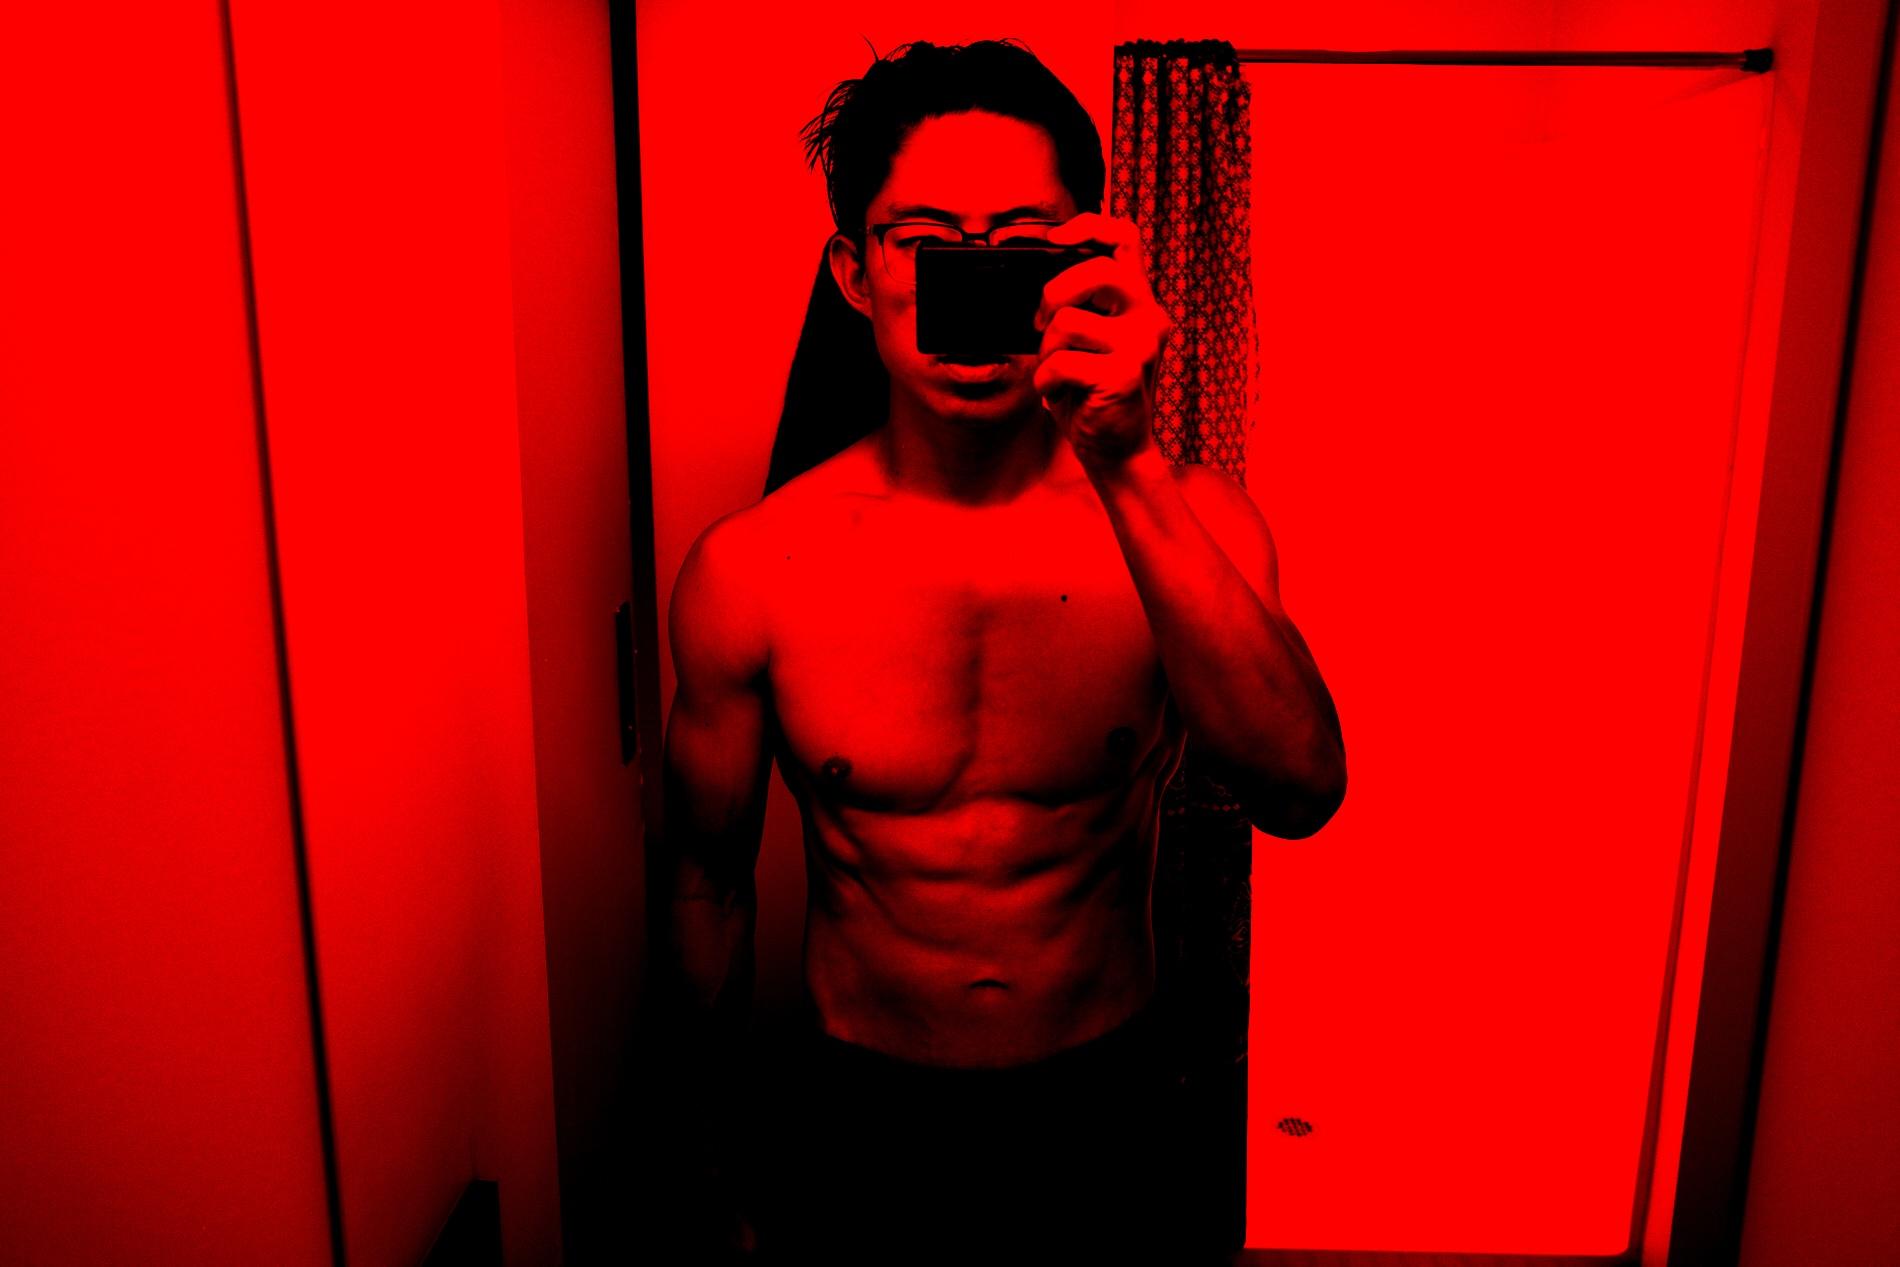 Front. Eric kim flex